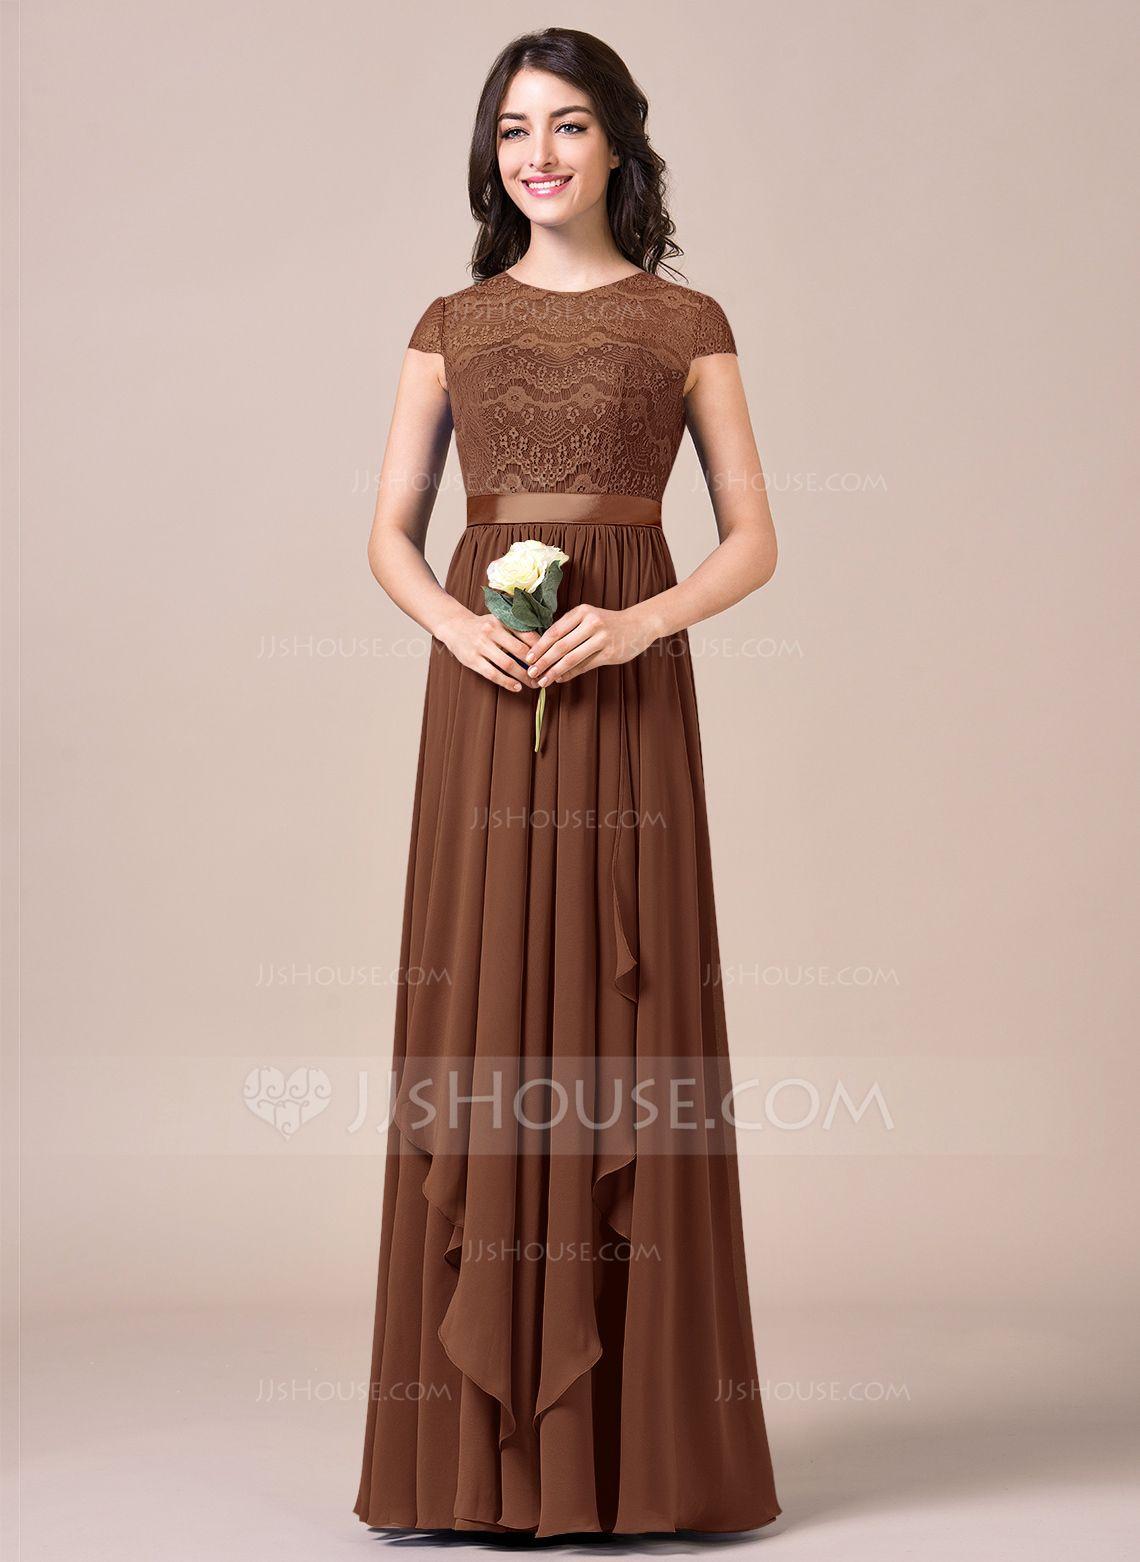 3b40936fd A-Line/Princess Scoop Neck Floor-Length Chiffon Lace Bridesmaid Dress With  Bow(s) Cascading Ruffles (007057698) - JJsHouse